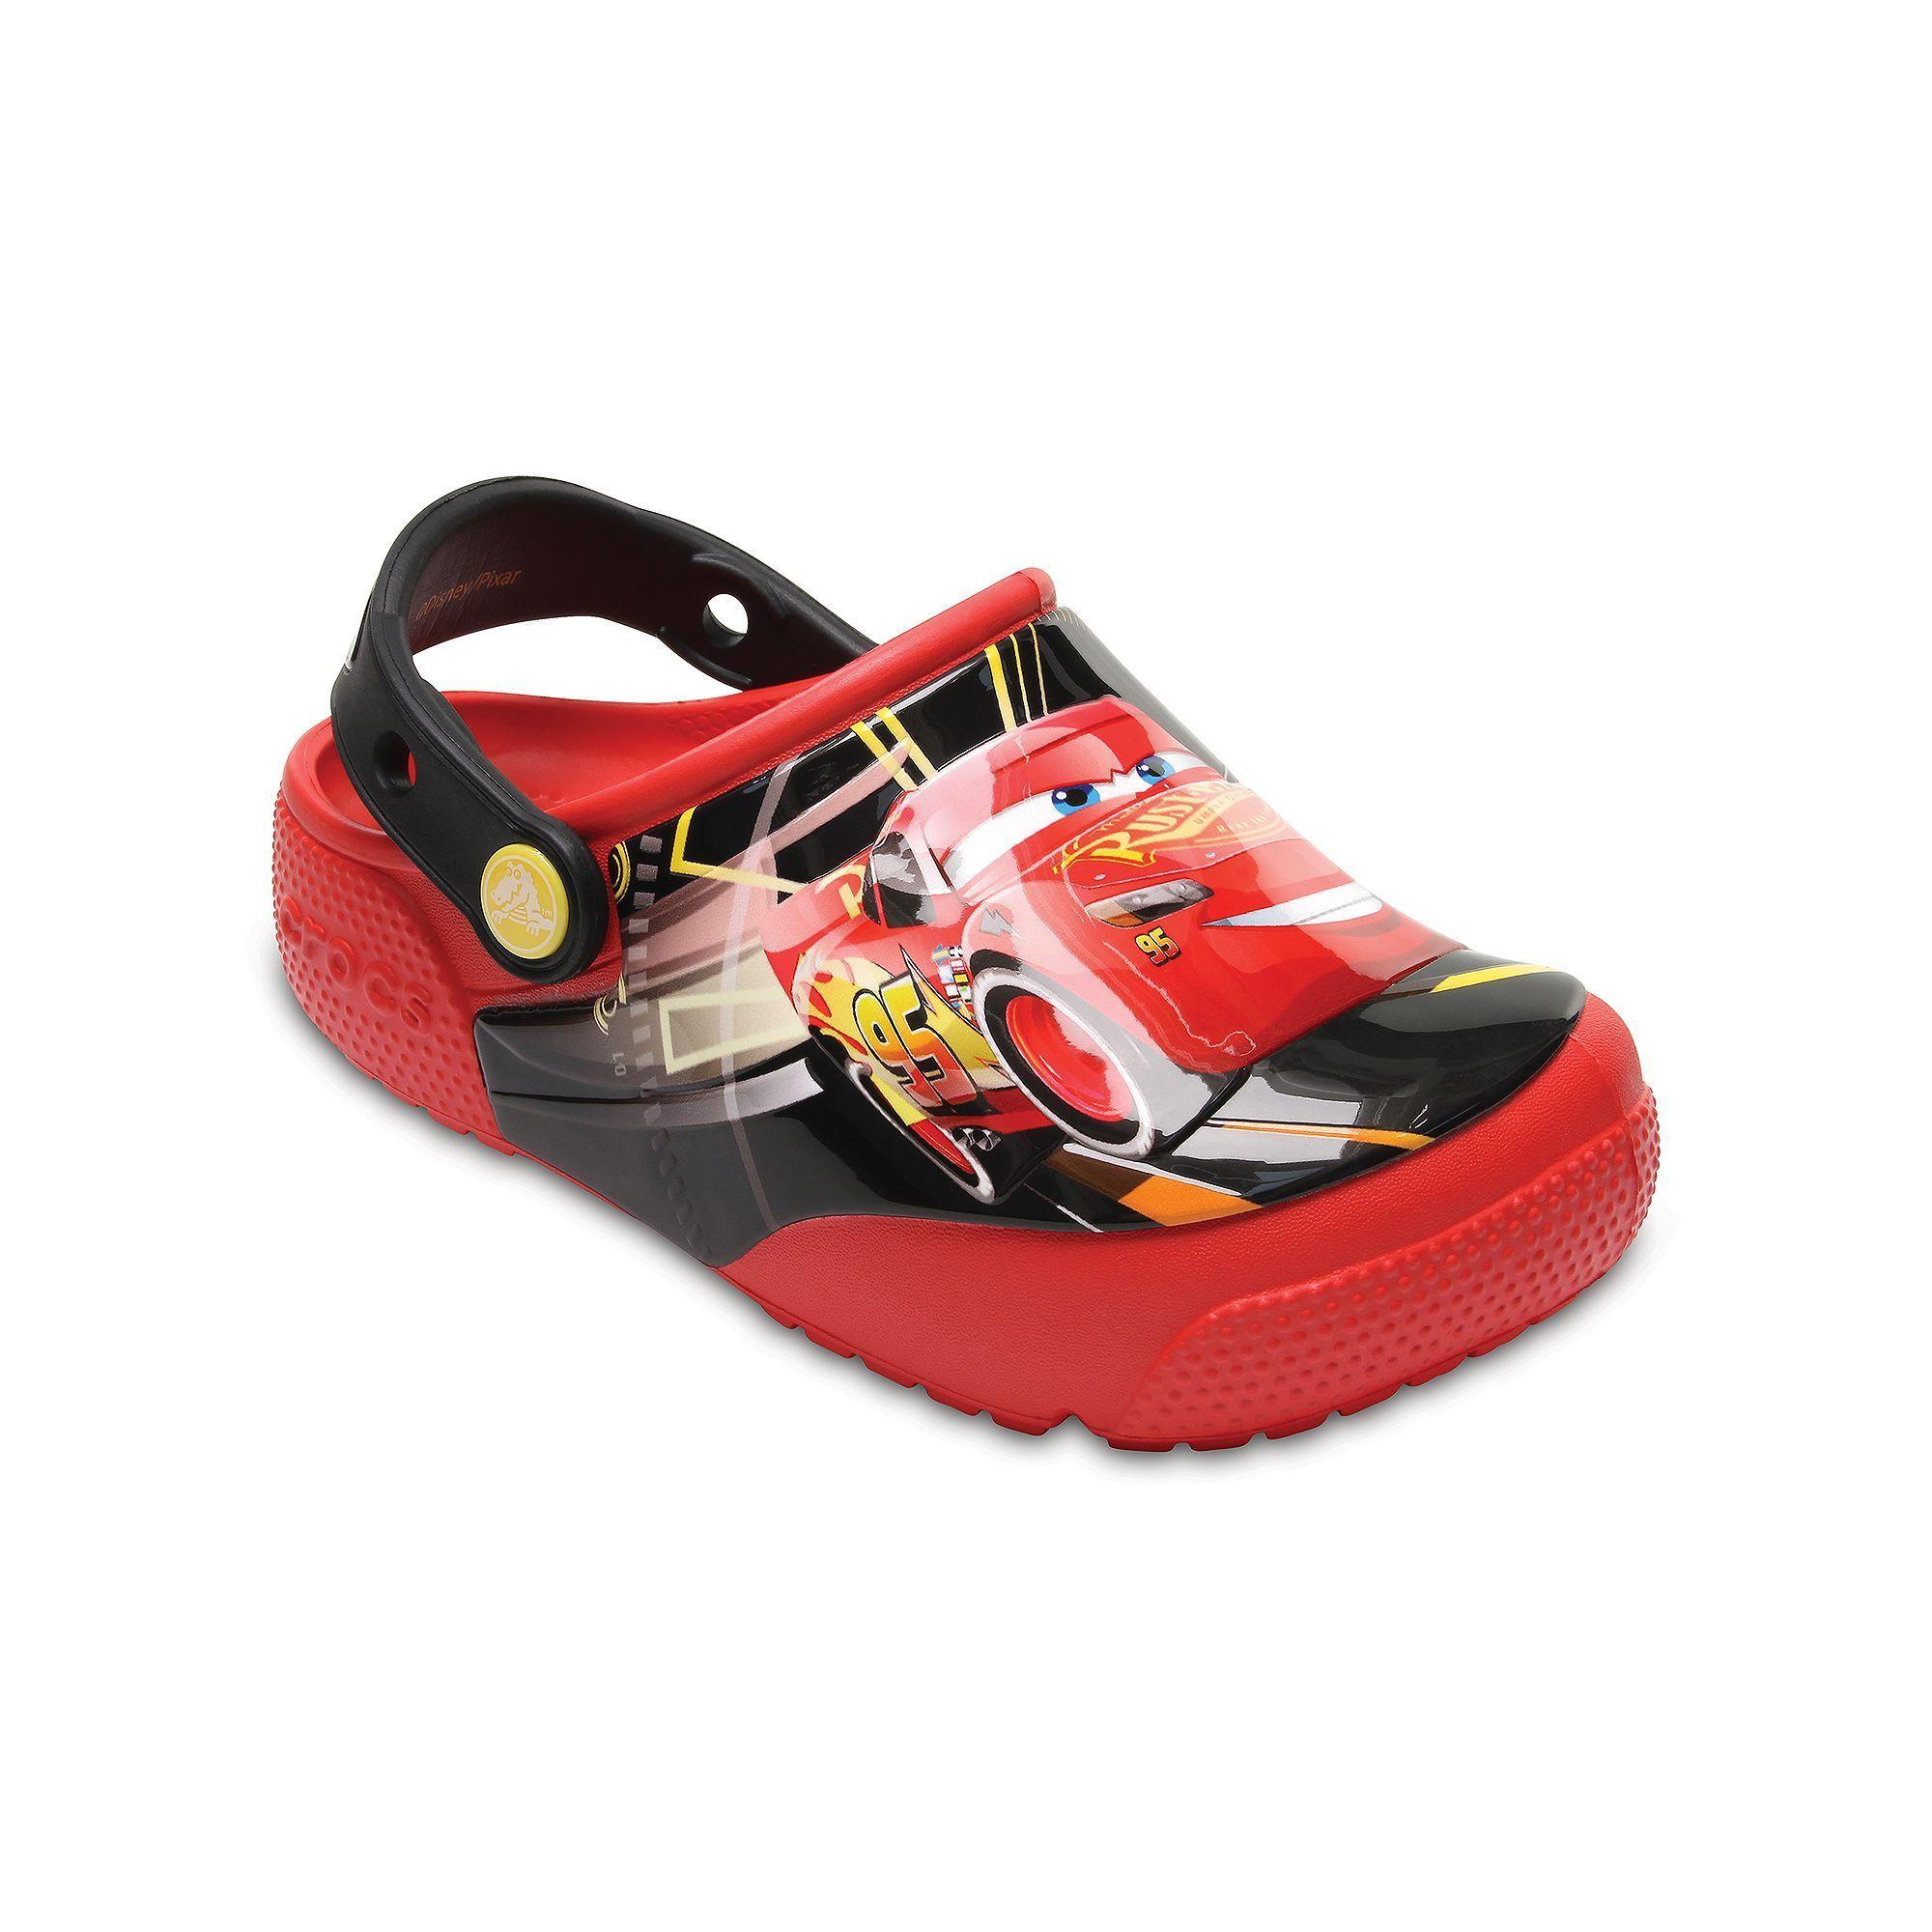 e7b987646295f8 Crocs Disney   Pixar Cars Lightning McQueen Kids Light-Up Clogs ...